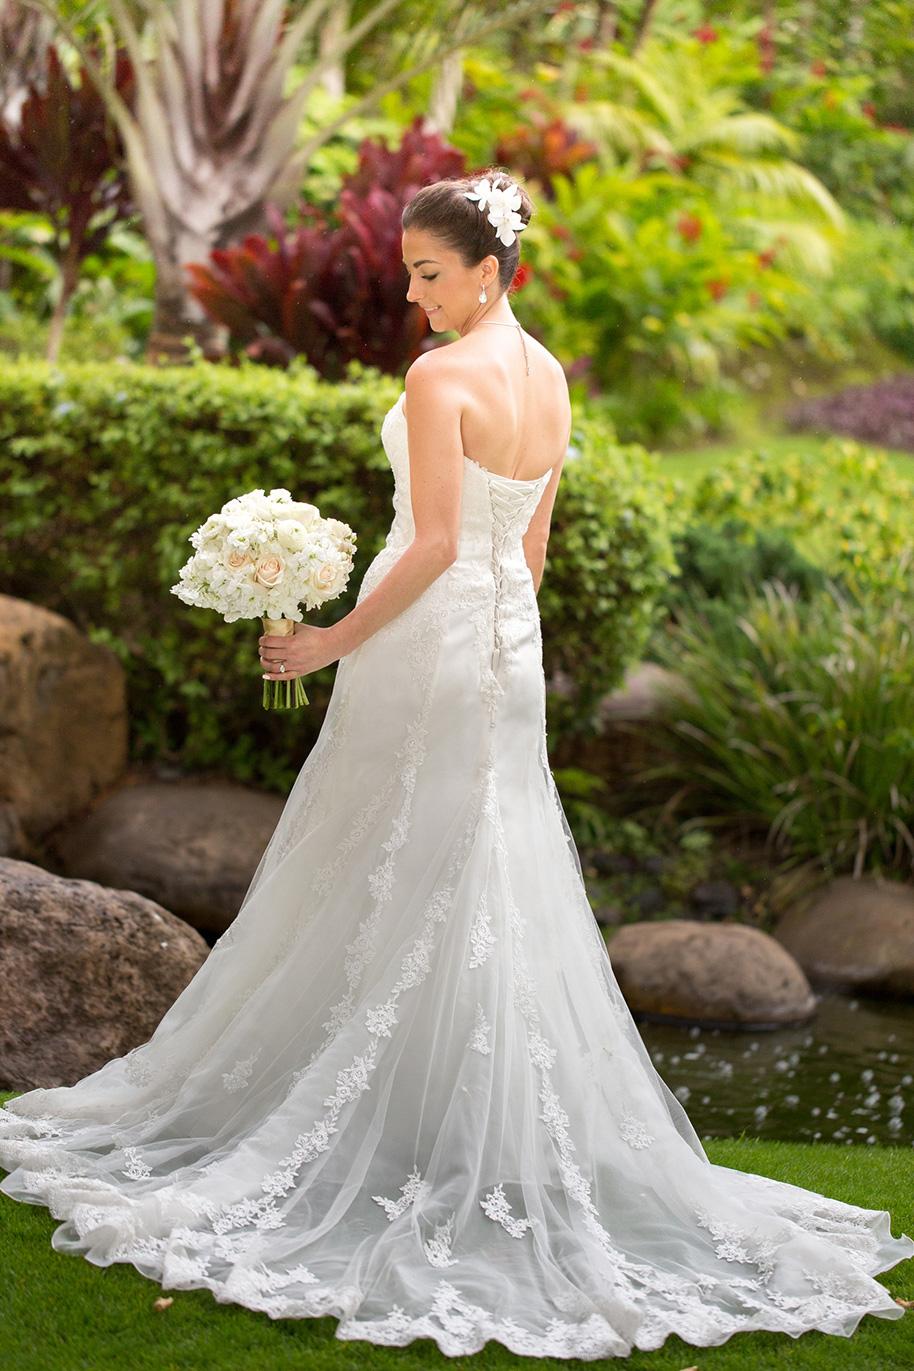 Maui-Ocean-Front-Wedding-070816-7